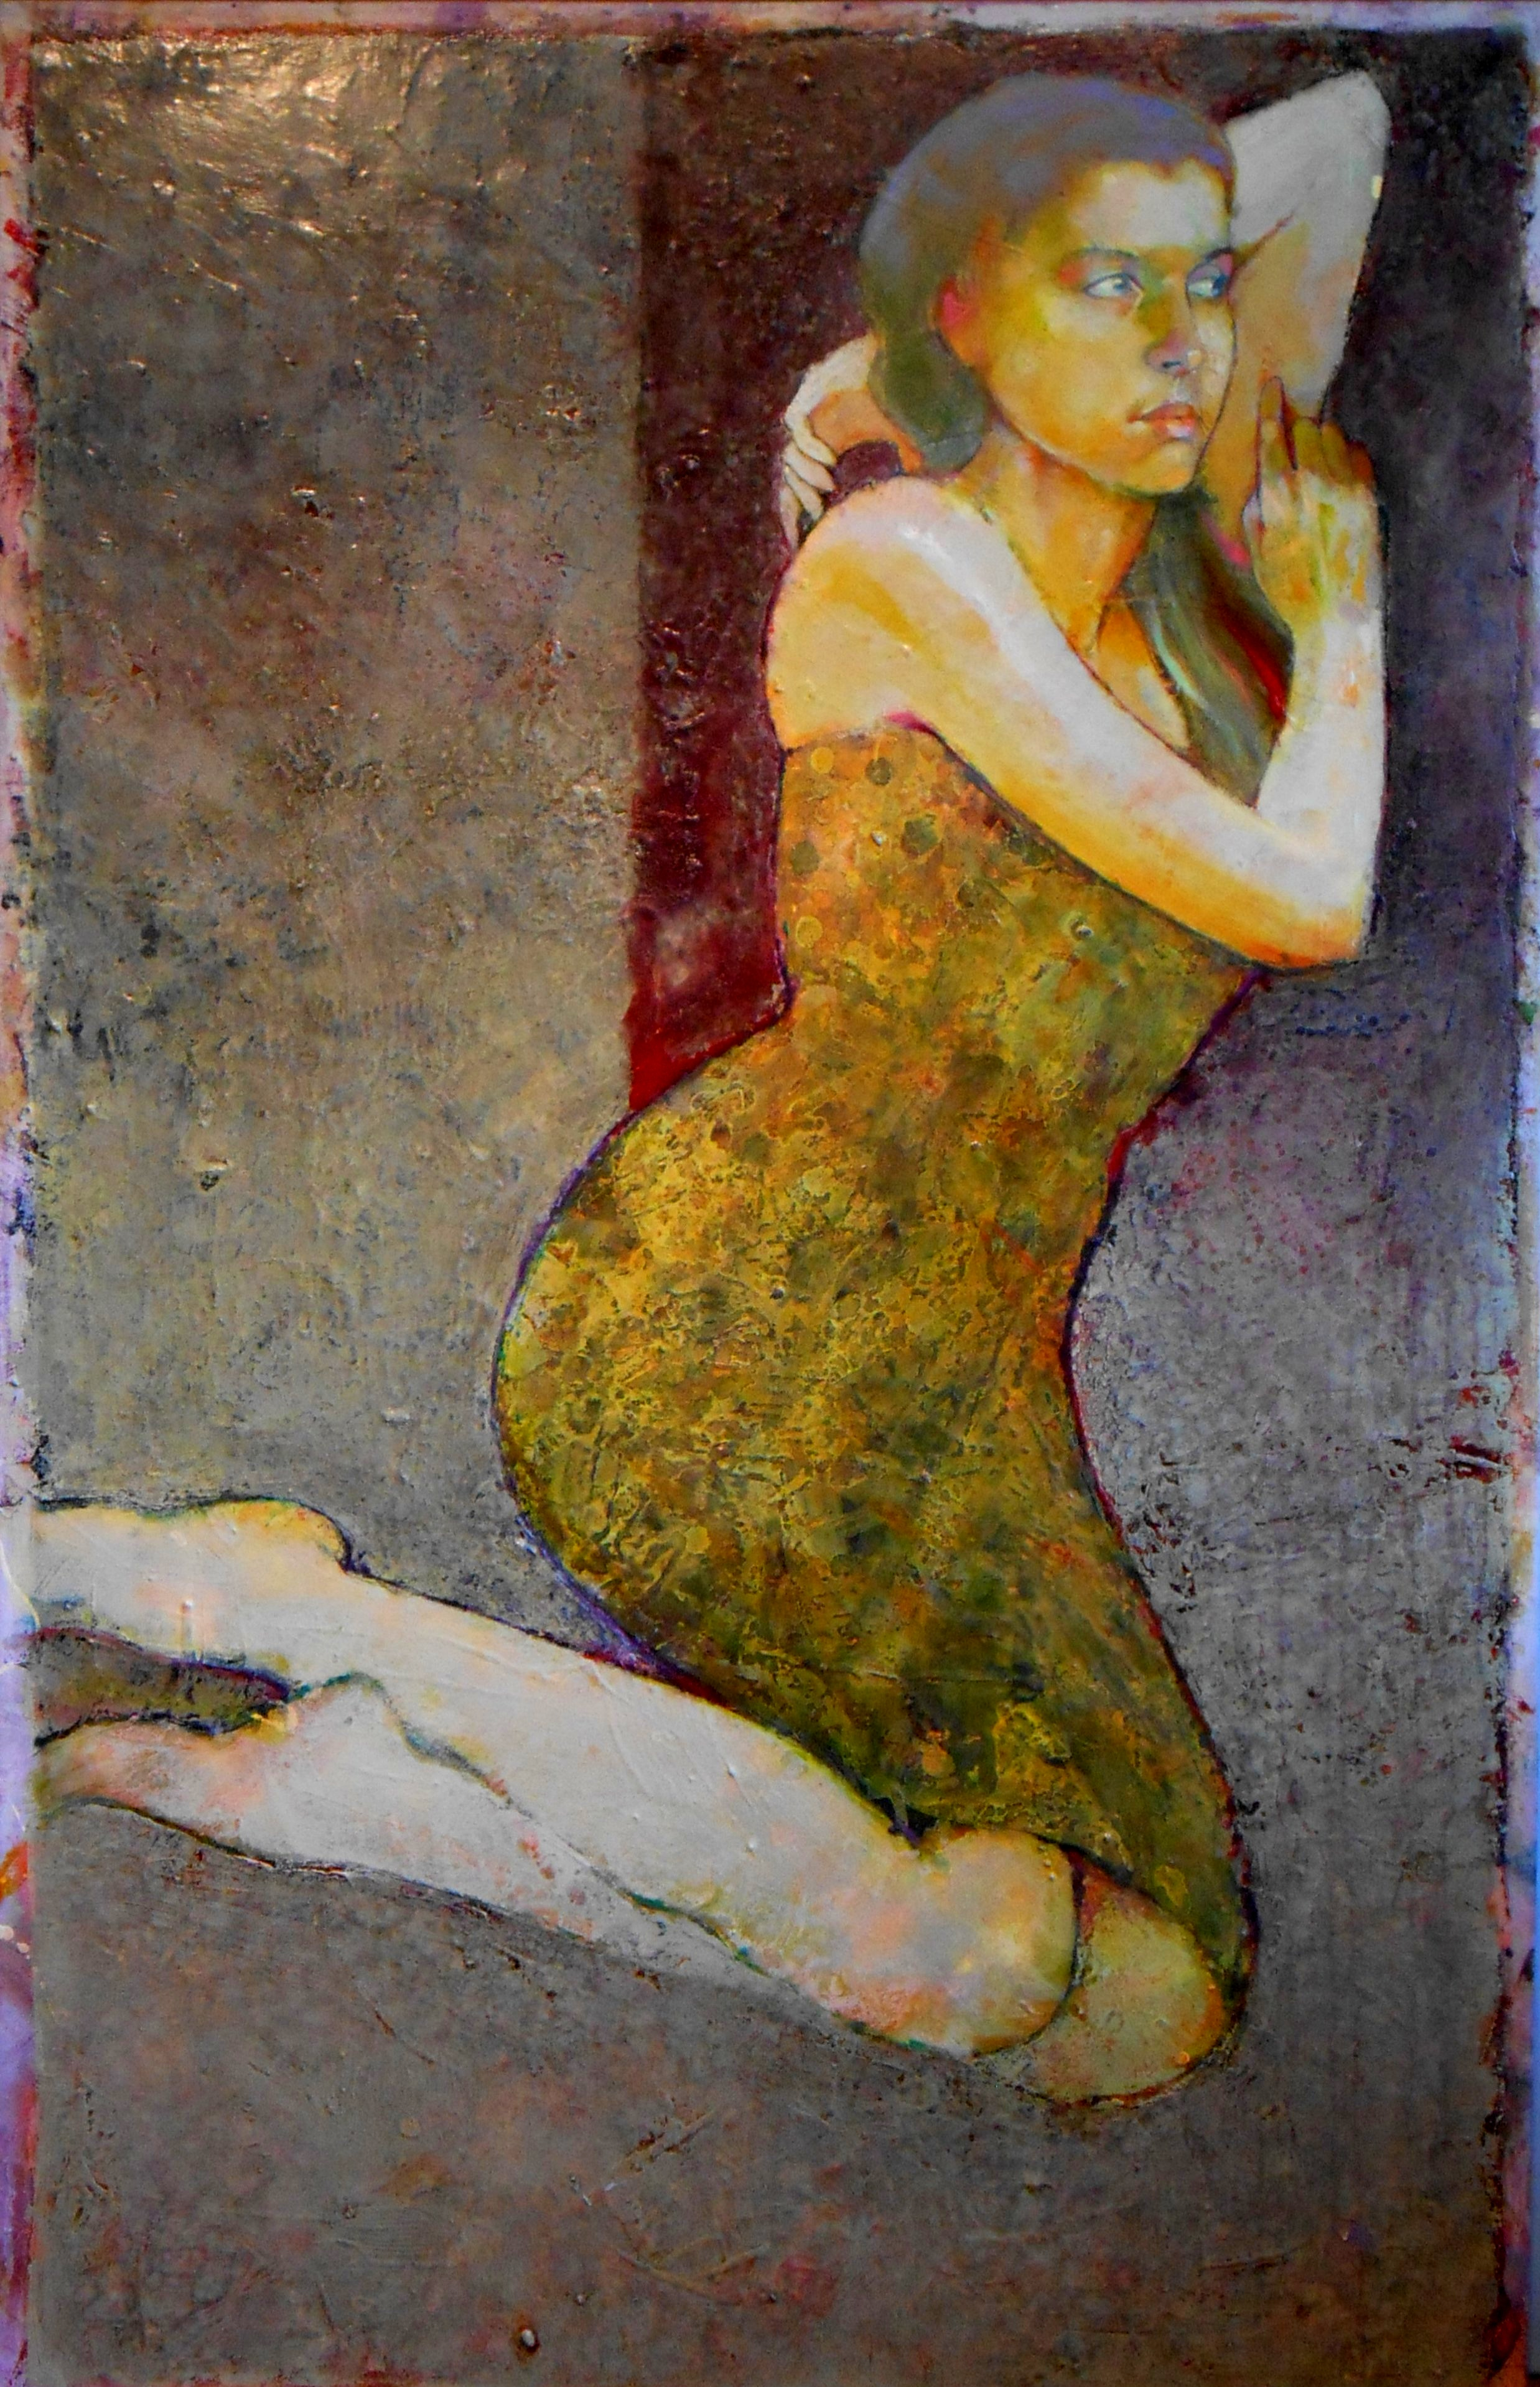 Paint+8.+When_Oil+on+Canvas_+2010_50x30.jpg